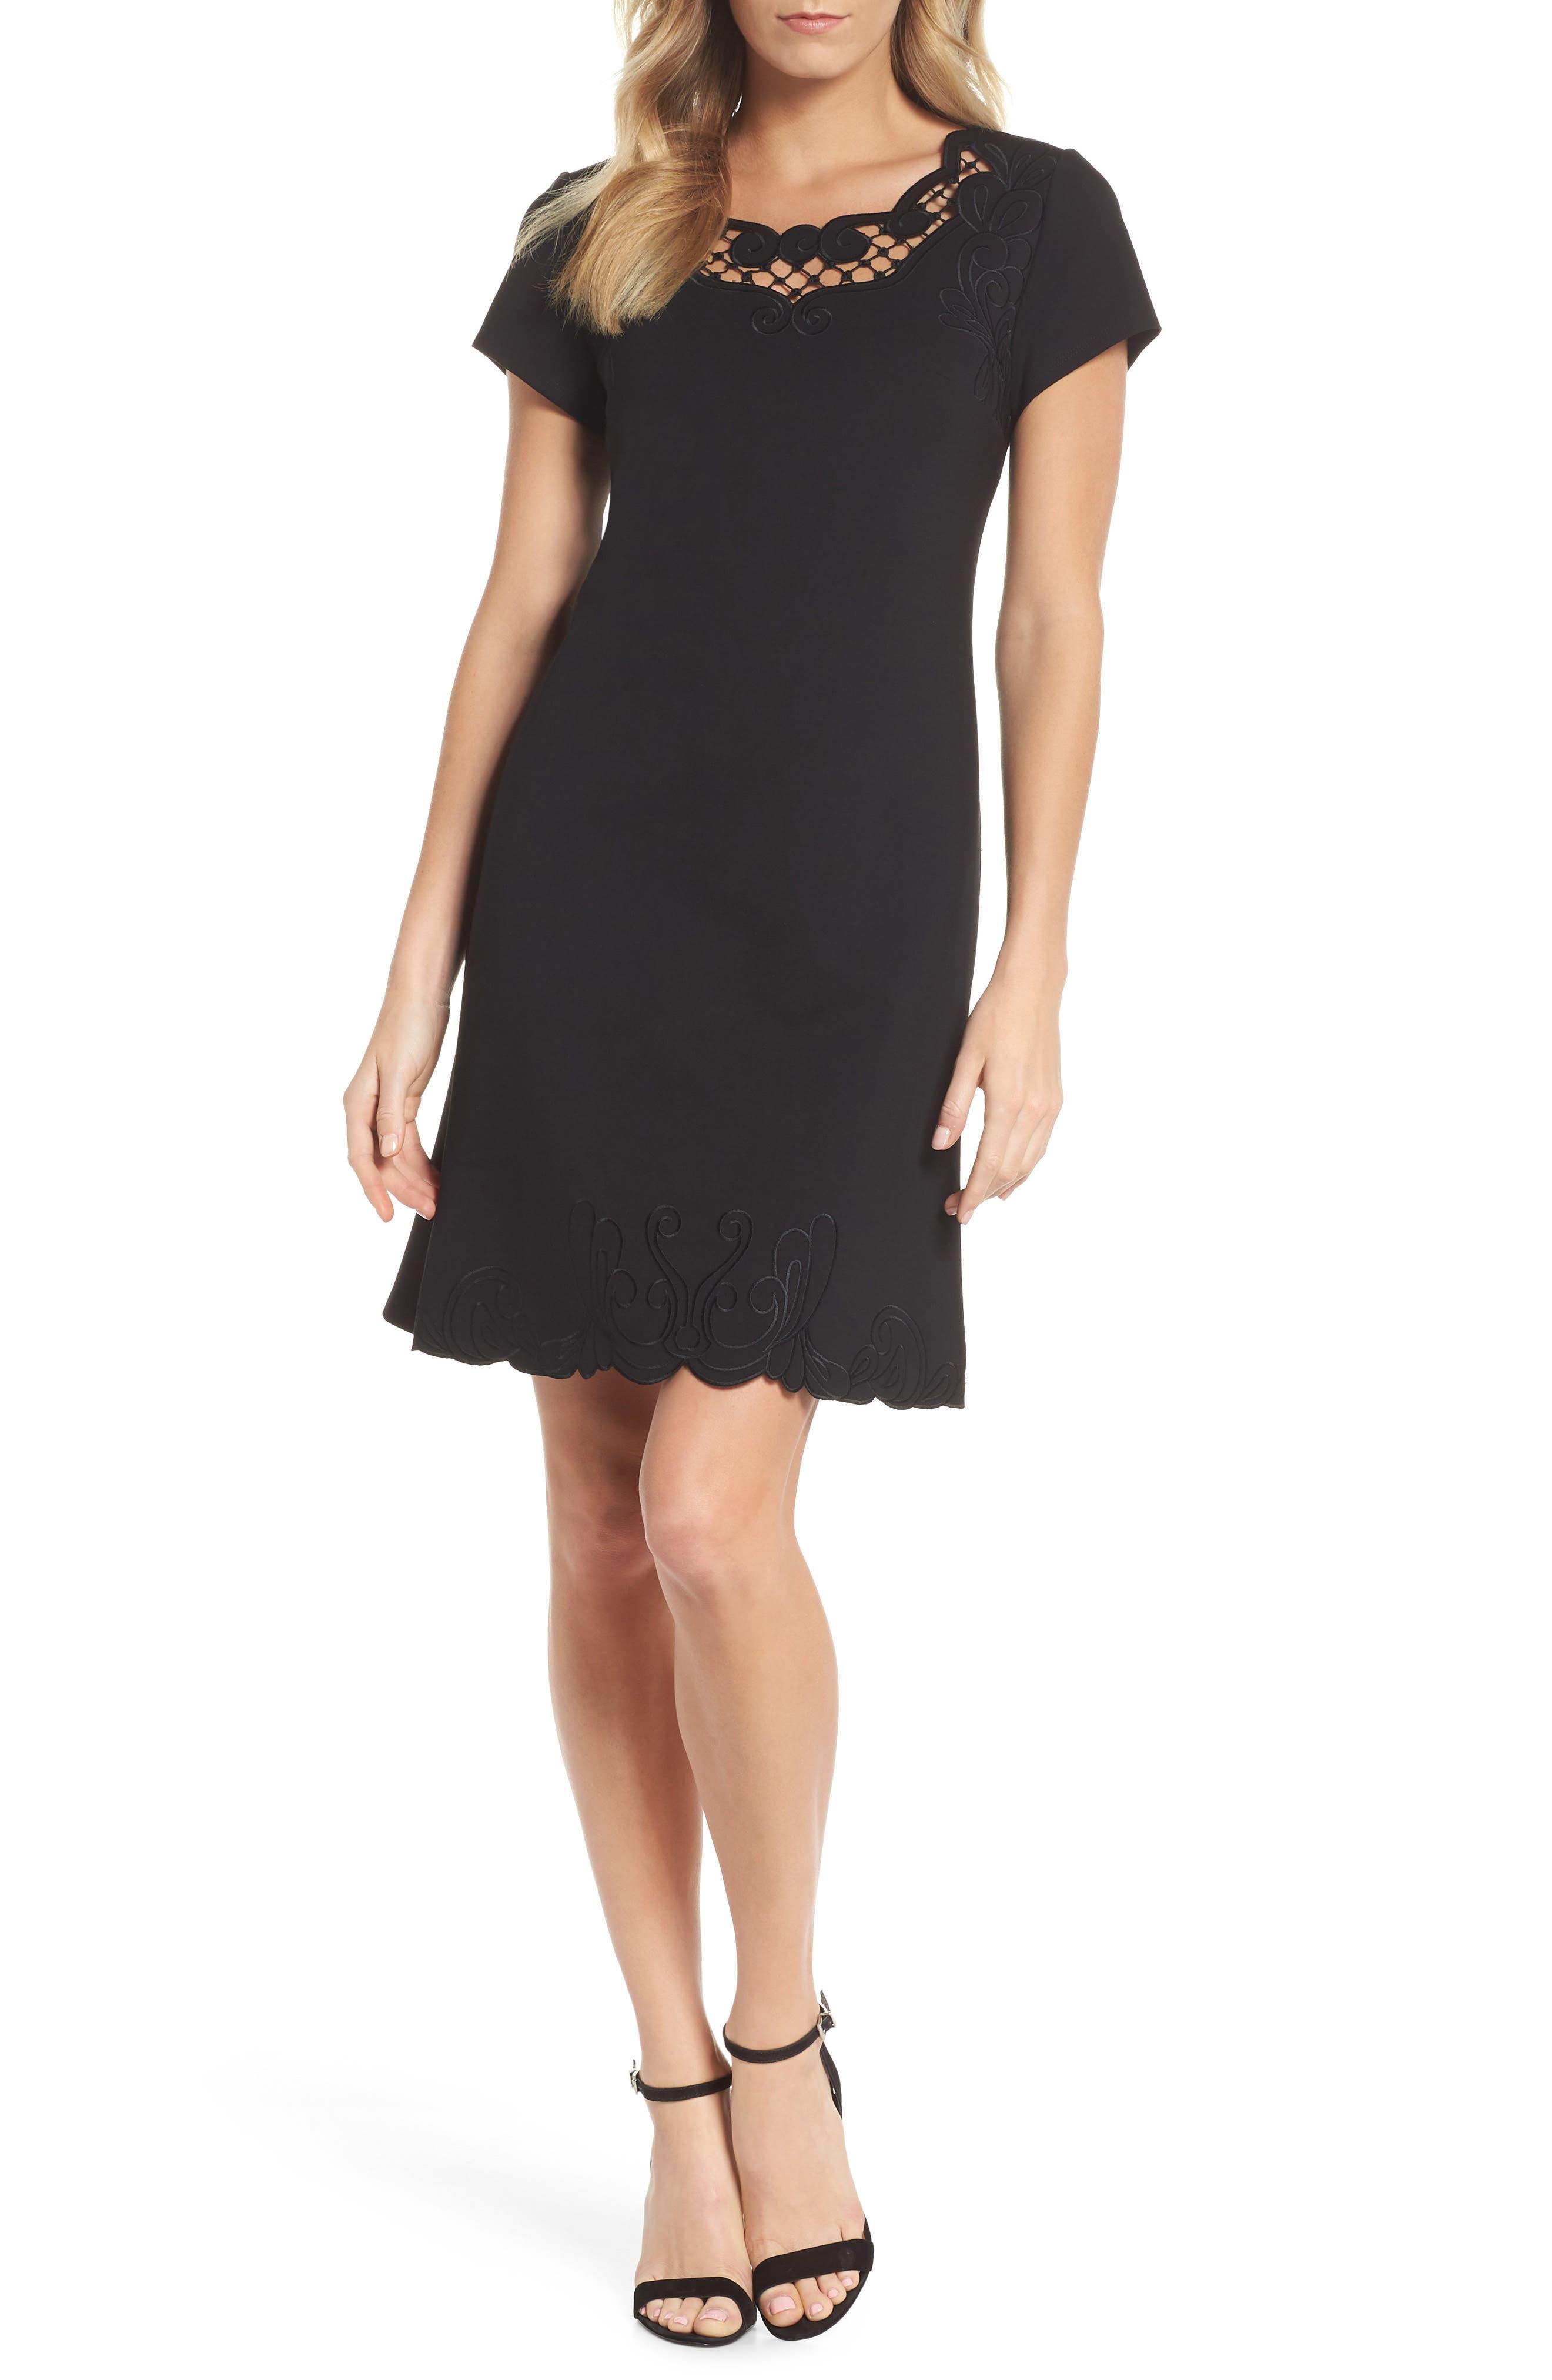 KOBI HALPERIN Tavi Cutout Neckline Dress, Main, color, 001